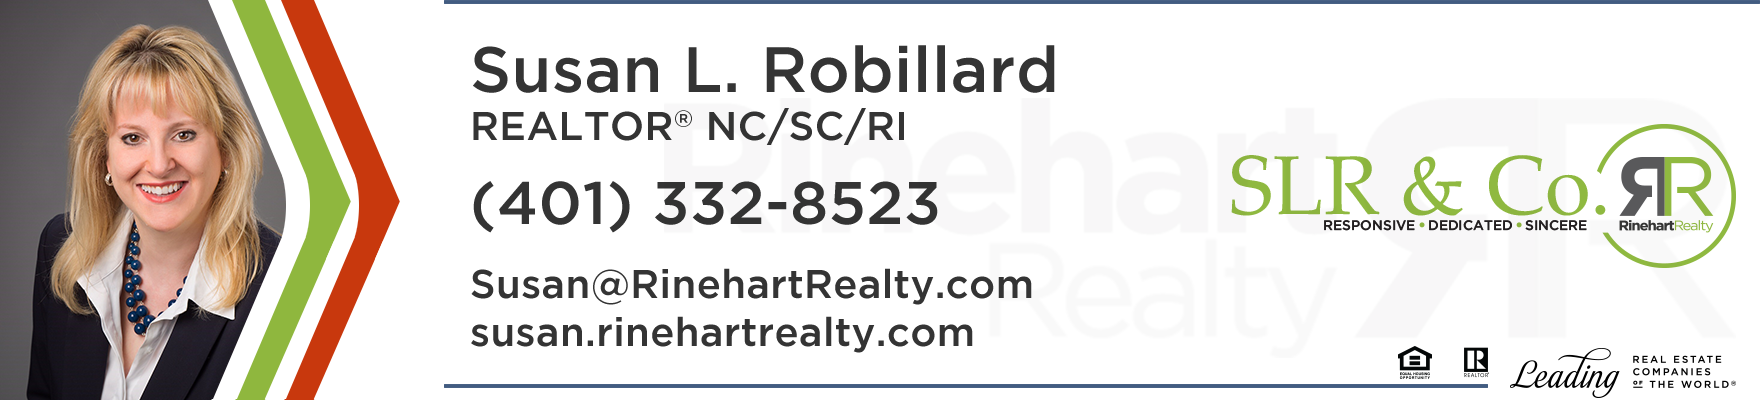 Susan Robillard REALTOR SC NC RI